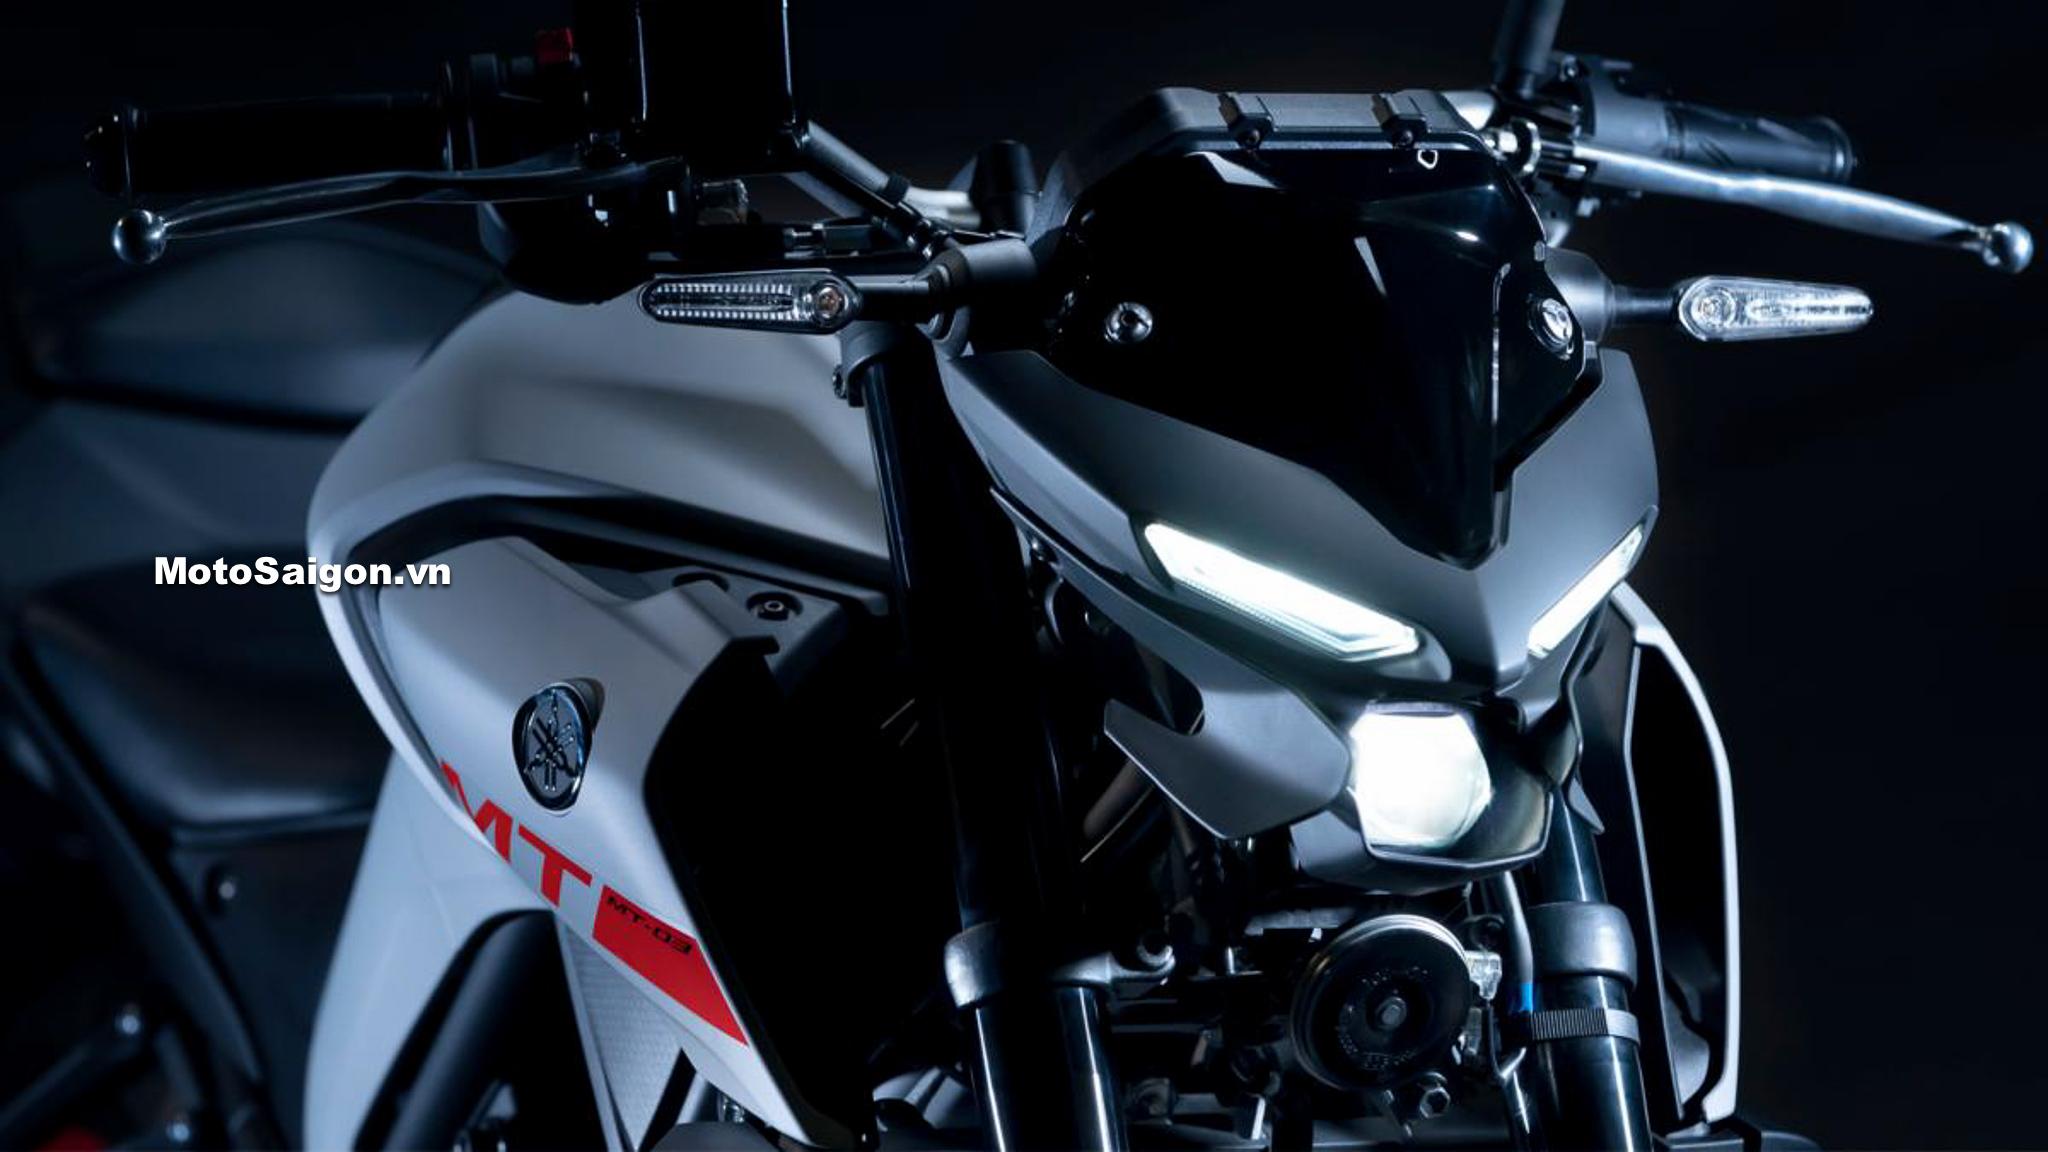 yamaha mt 03 abs 2020 danh gia xe motosaigon 14